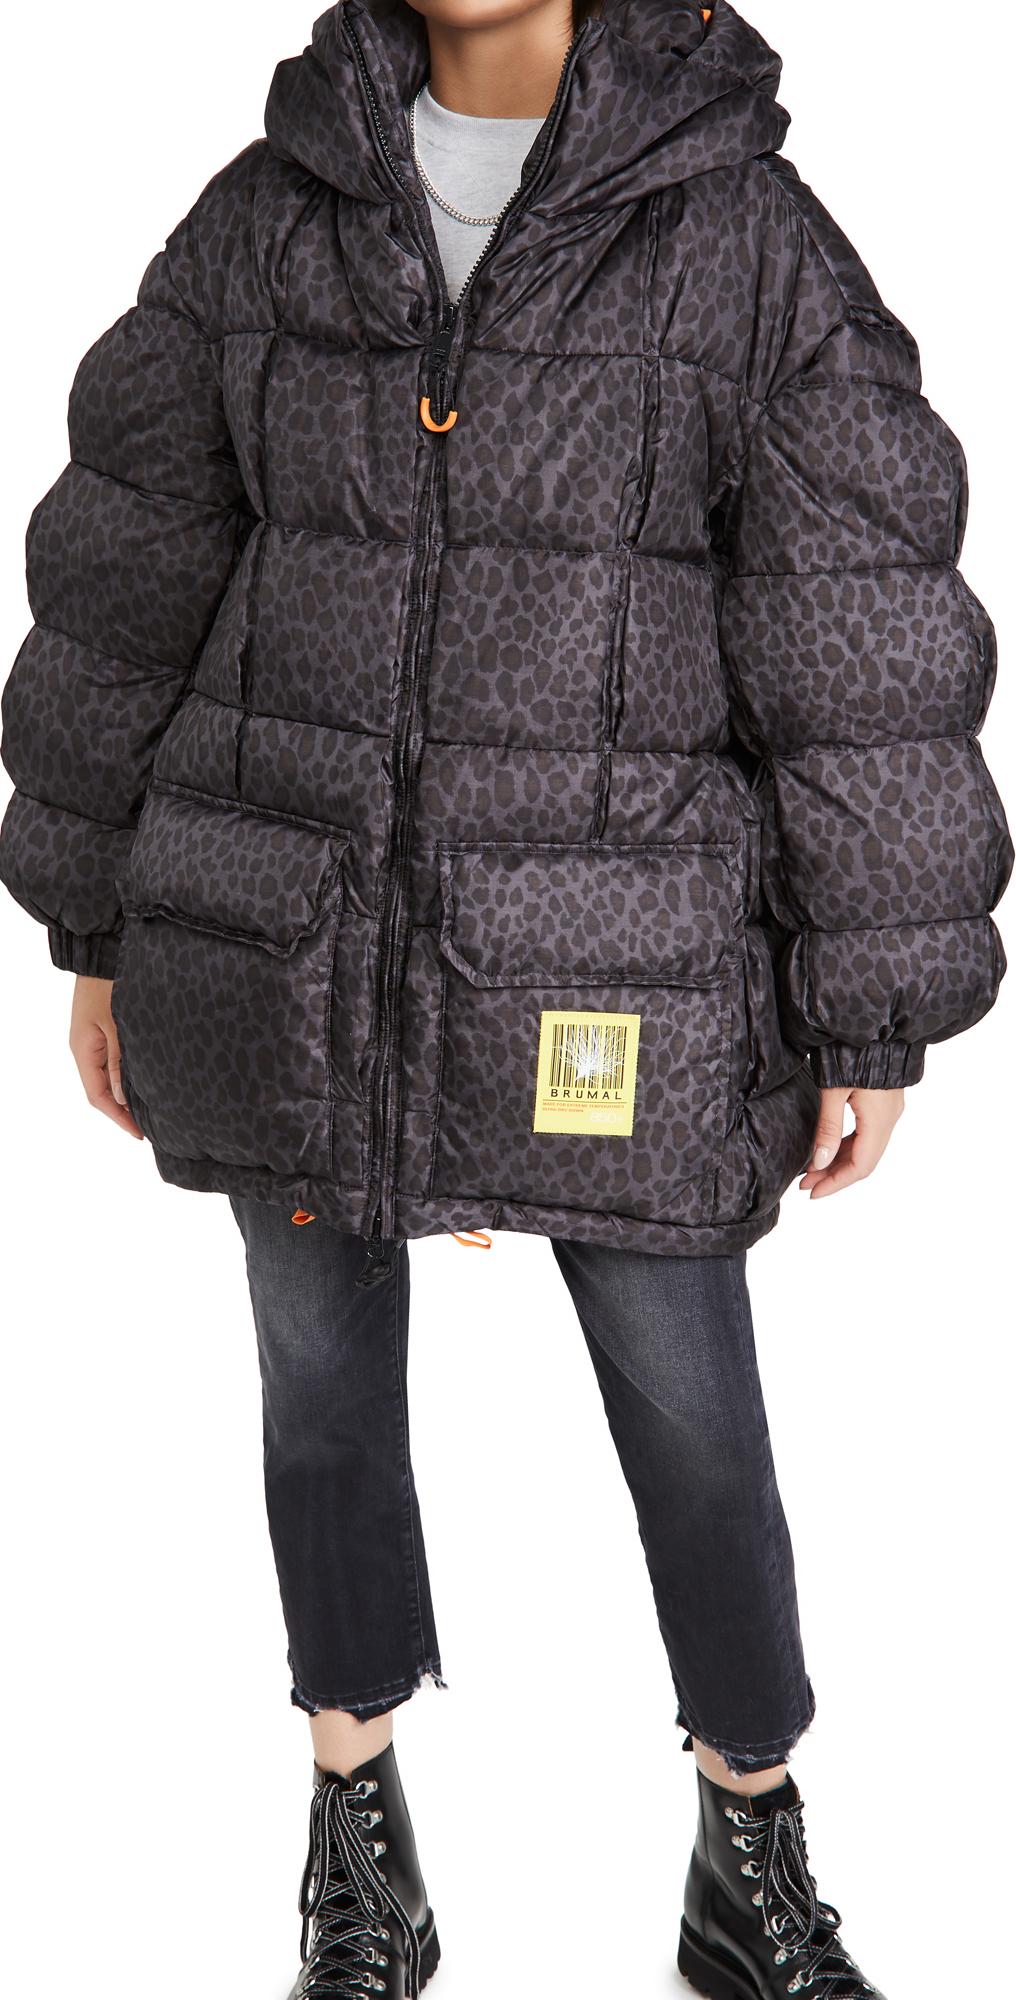 BRUMAL Mid-Length Down Hooded Jacket